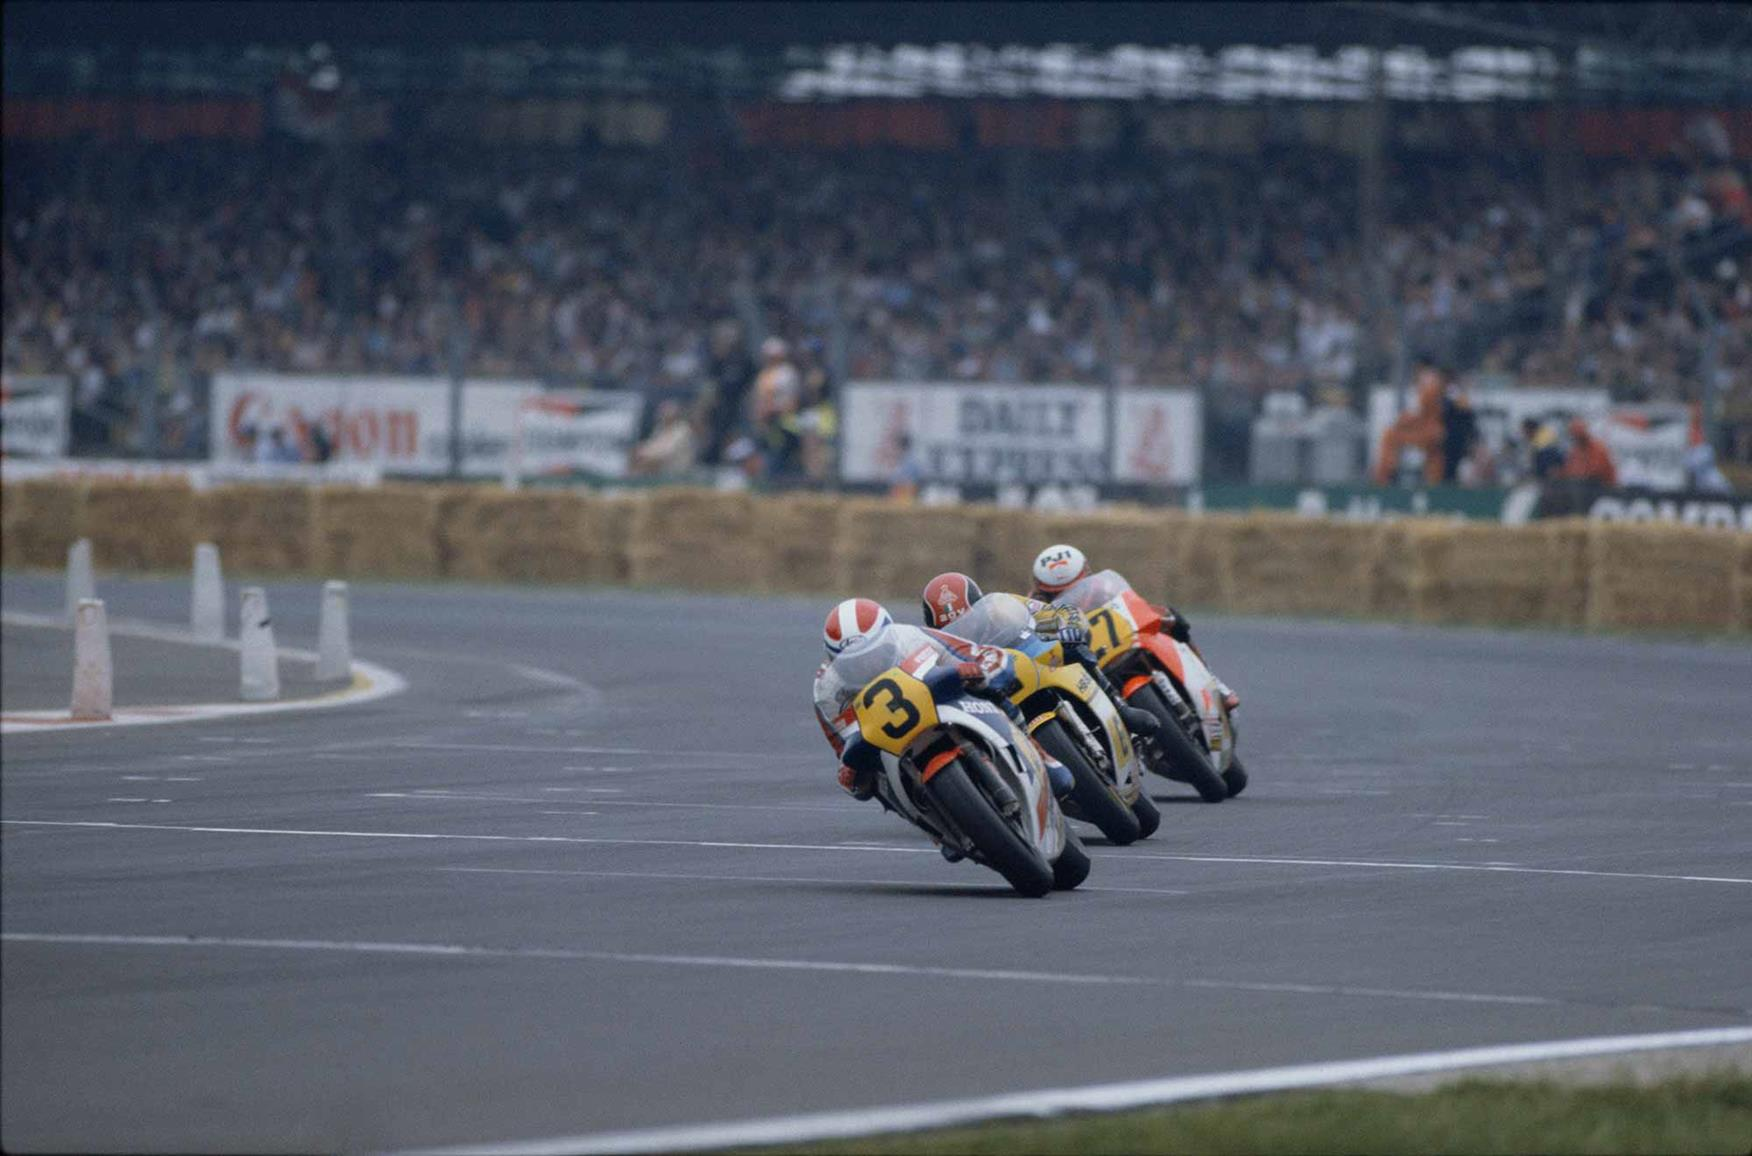 The 1983 British Grand Prix